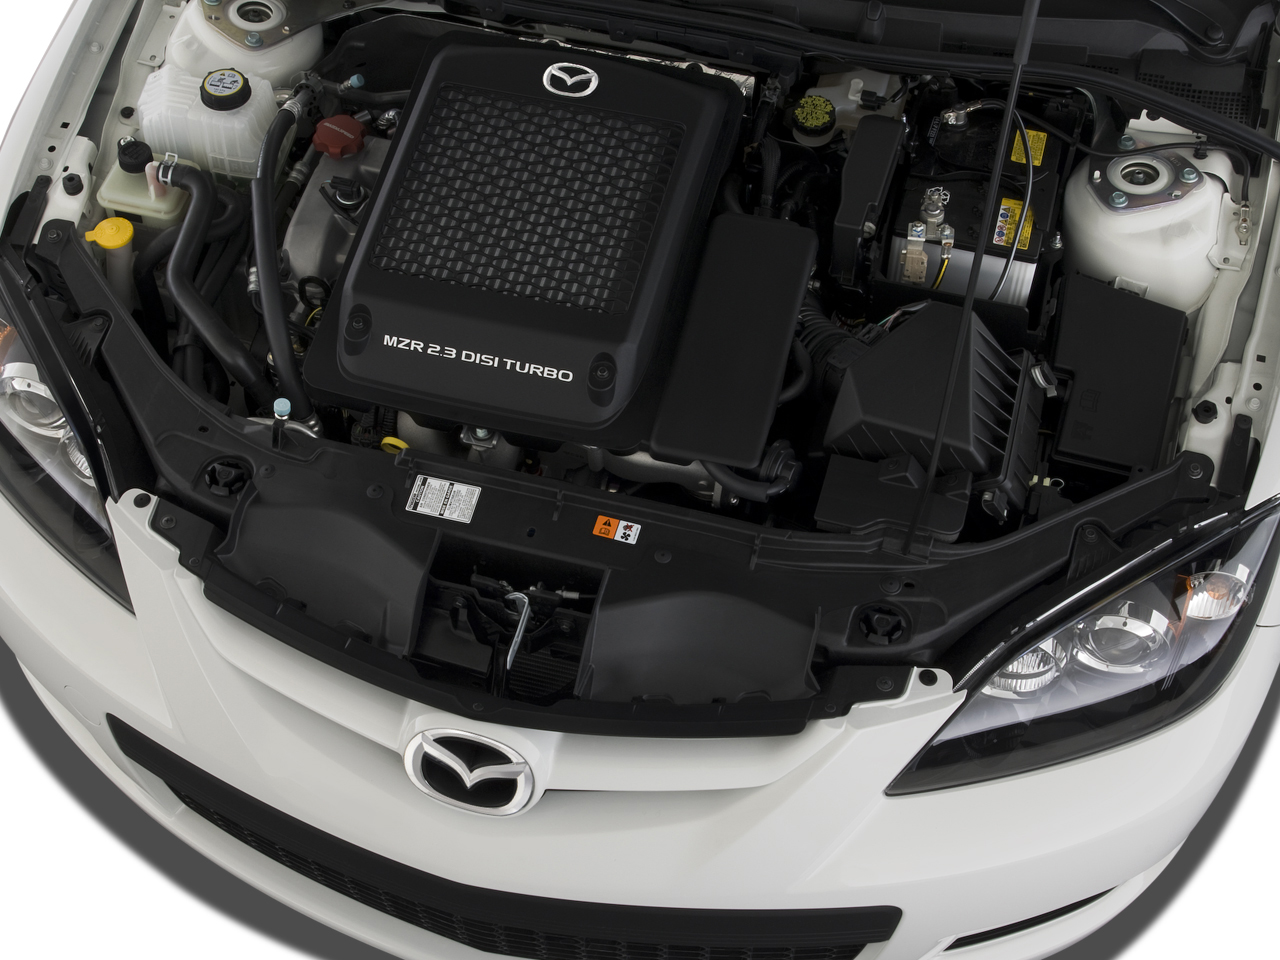 Mazda 3 Service Manual: Drive Belt Inspection Mzr 2.3 Disi Turbo